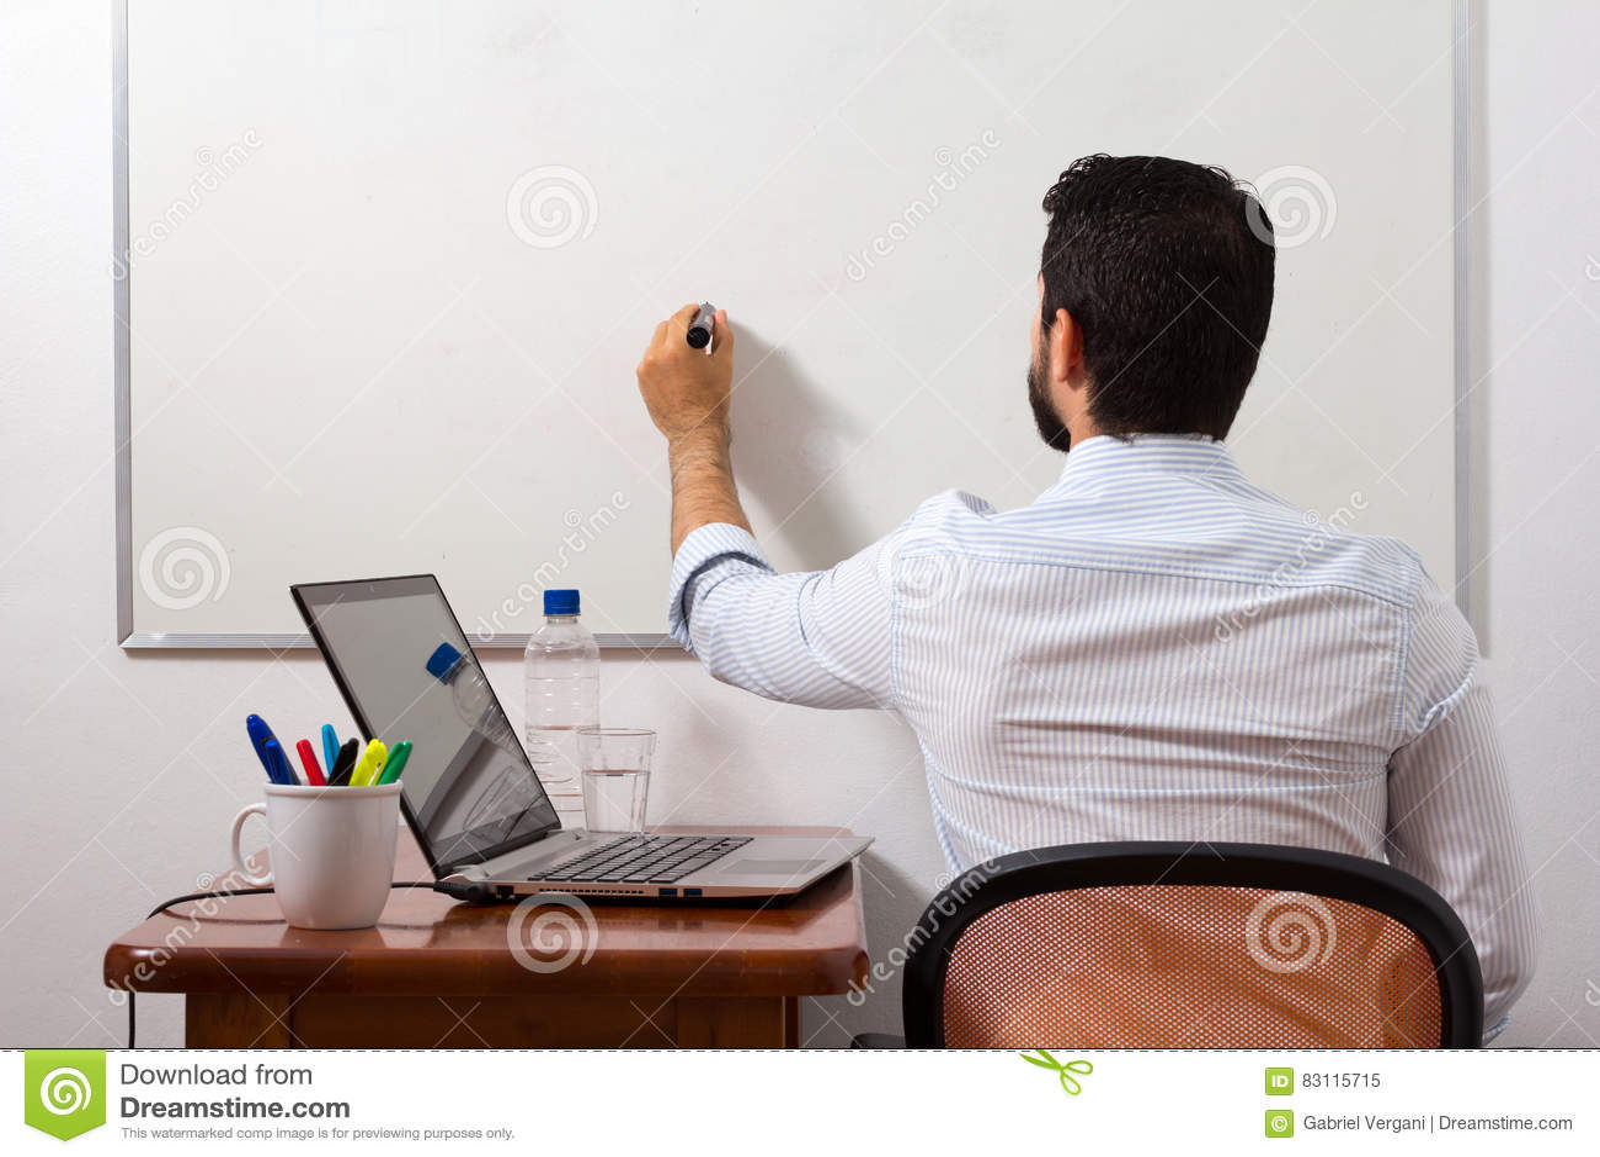 Whiteboard For Home Office. Ergonomic Home Office Whiteboard Ideas ...